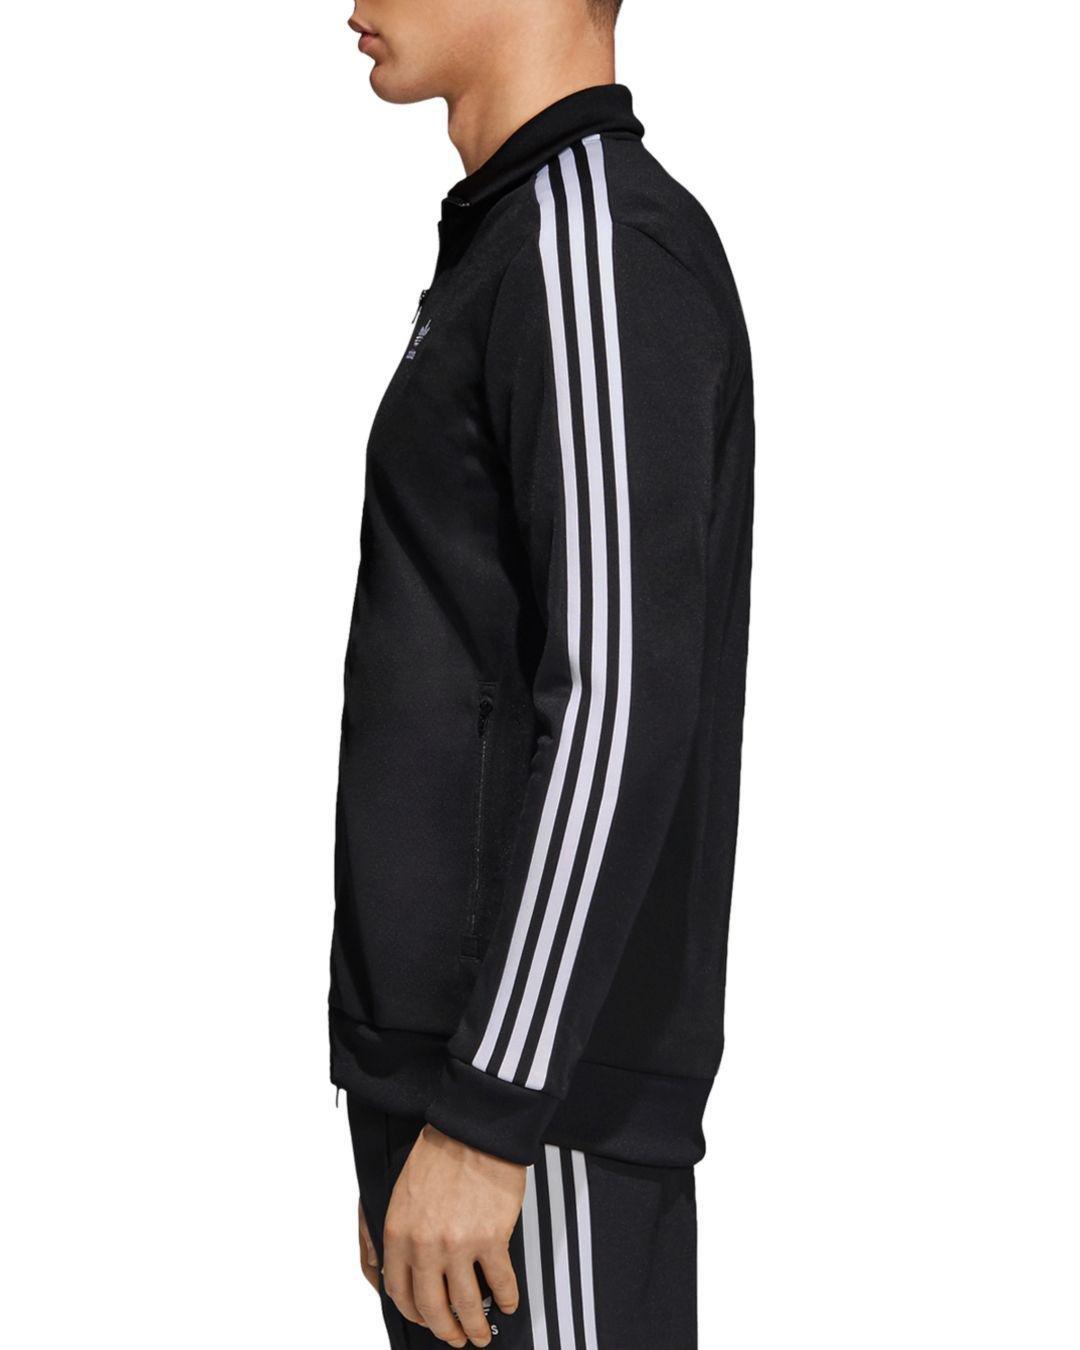 adidas Originals Beckenbauer Track Jacket in Black for Men - Lyst 3f2b64a8c